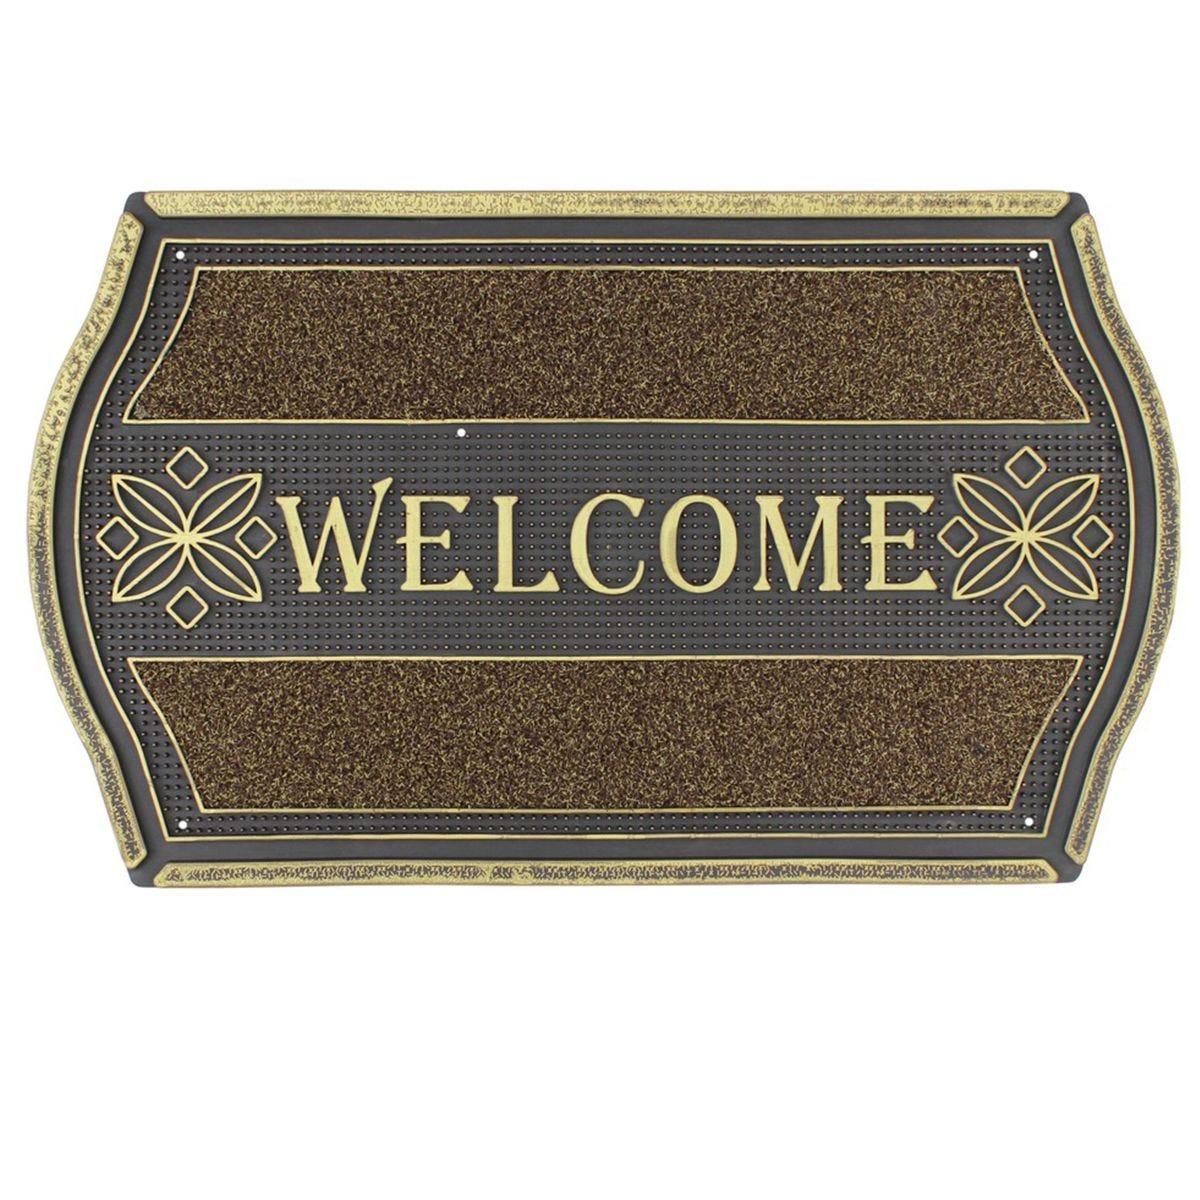 JVL 45x75cm Floral Look PVC Welcome Doormat - Gold/Black